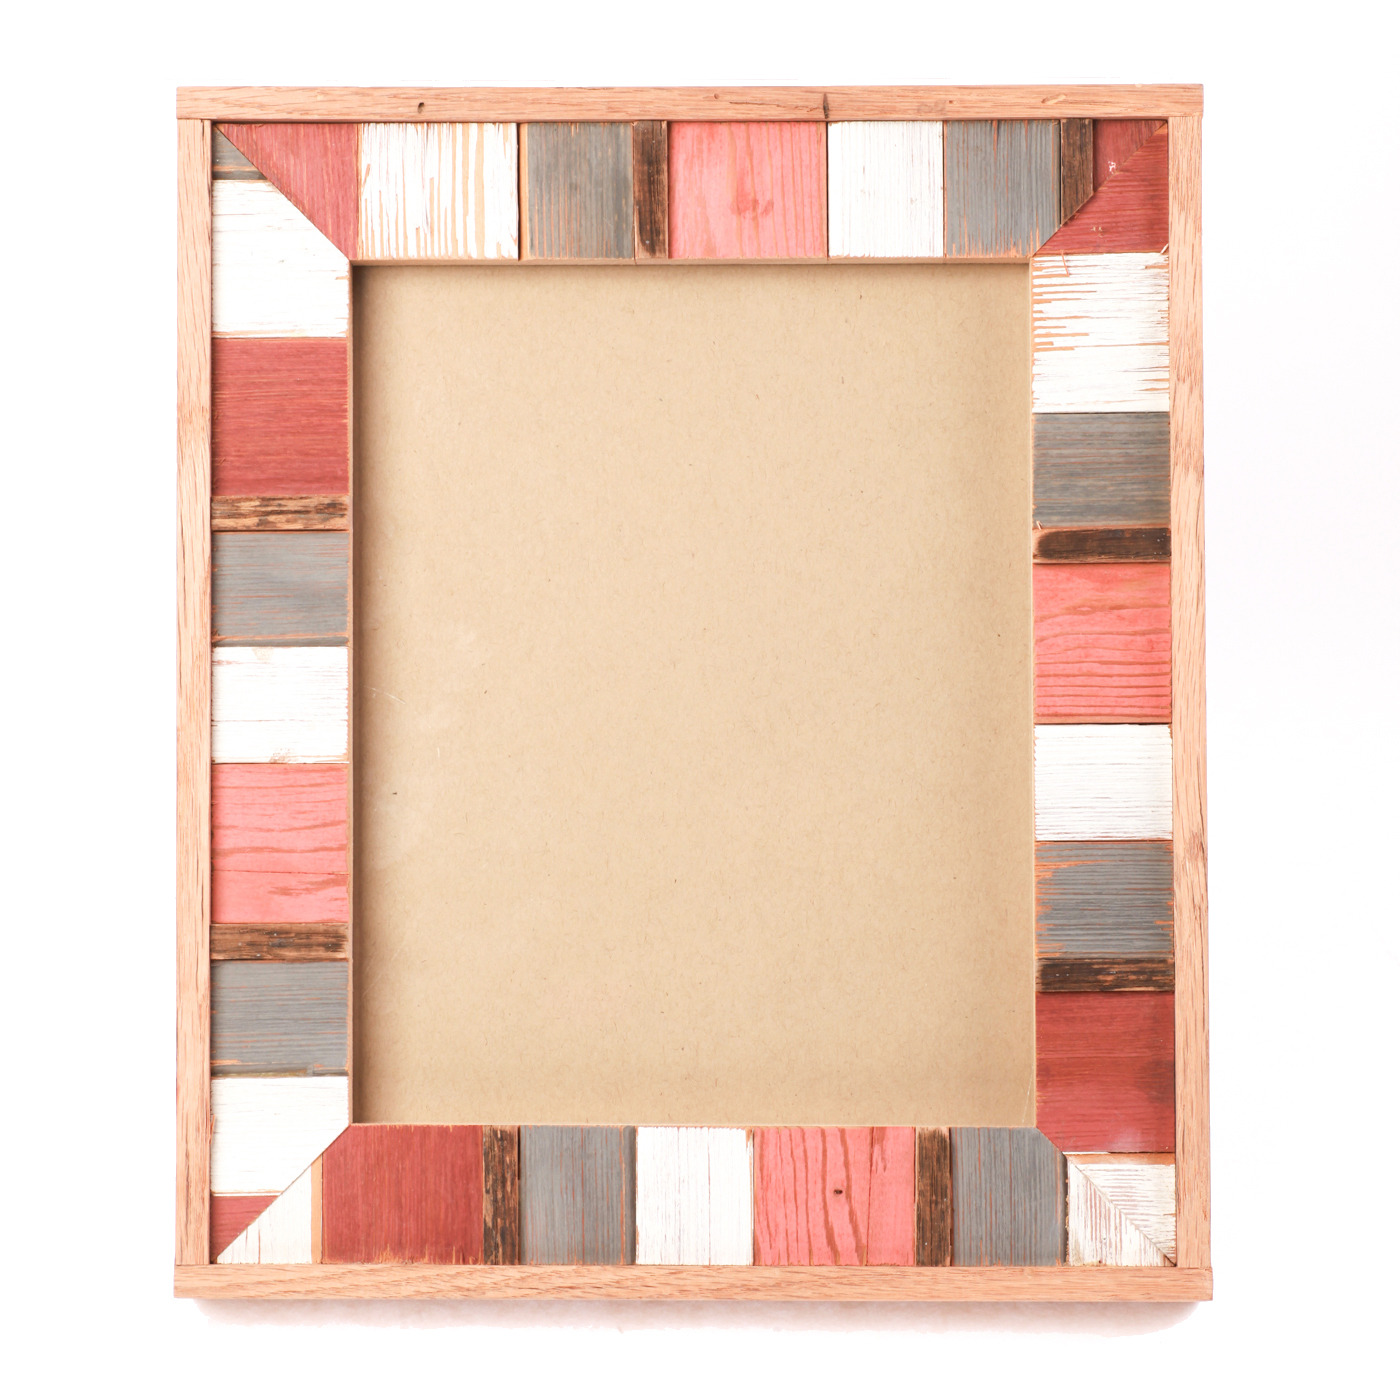 "Artisan, Eco-Friendly, Designer Mosaic Frame Red Clay 8"" x 10"""